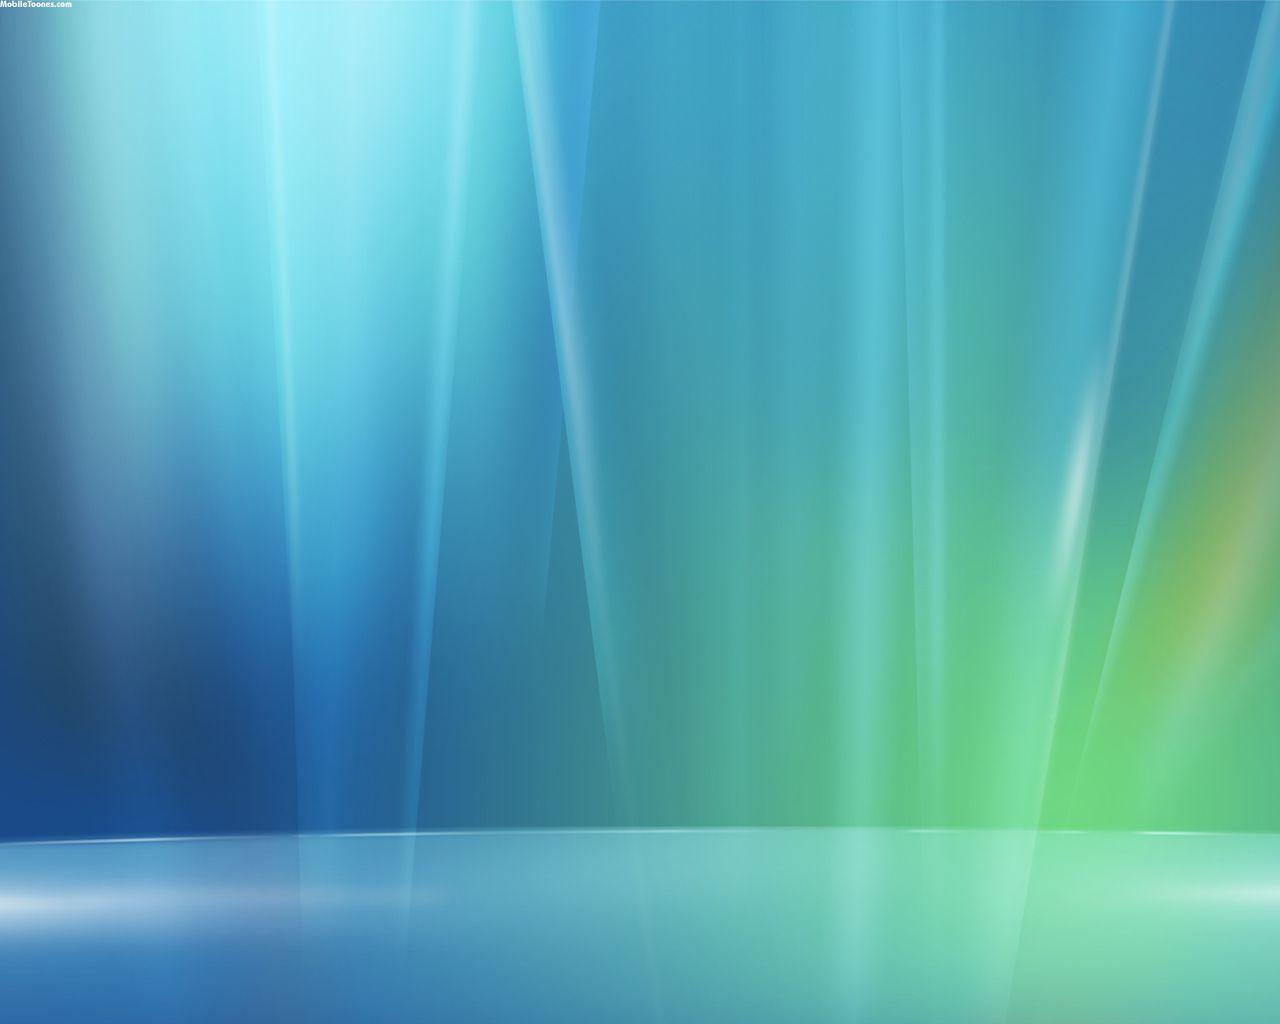 Vista_Aurora_Blue_Green Mobile Wallpaper